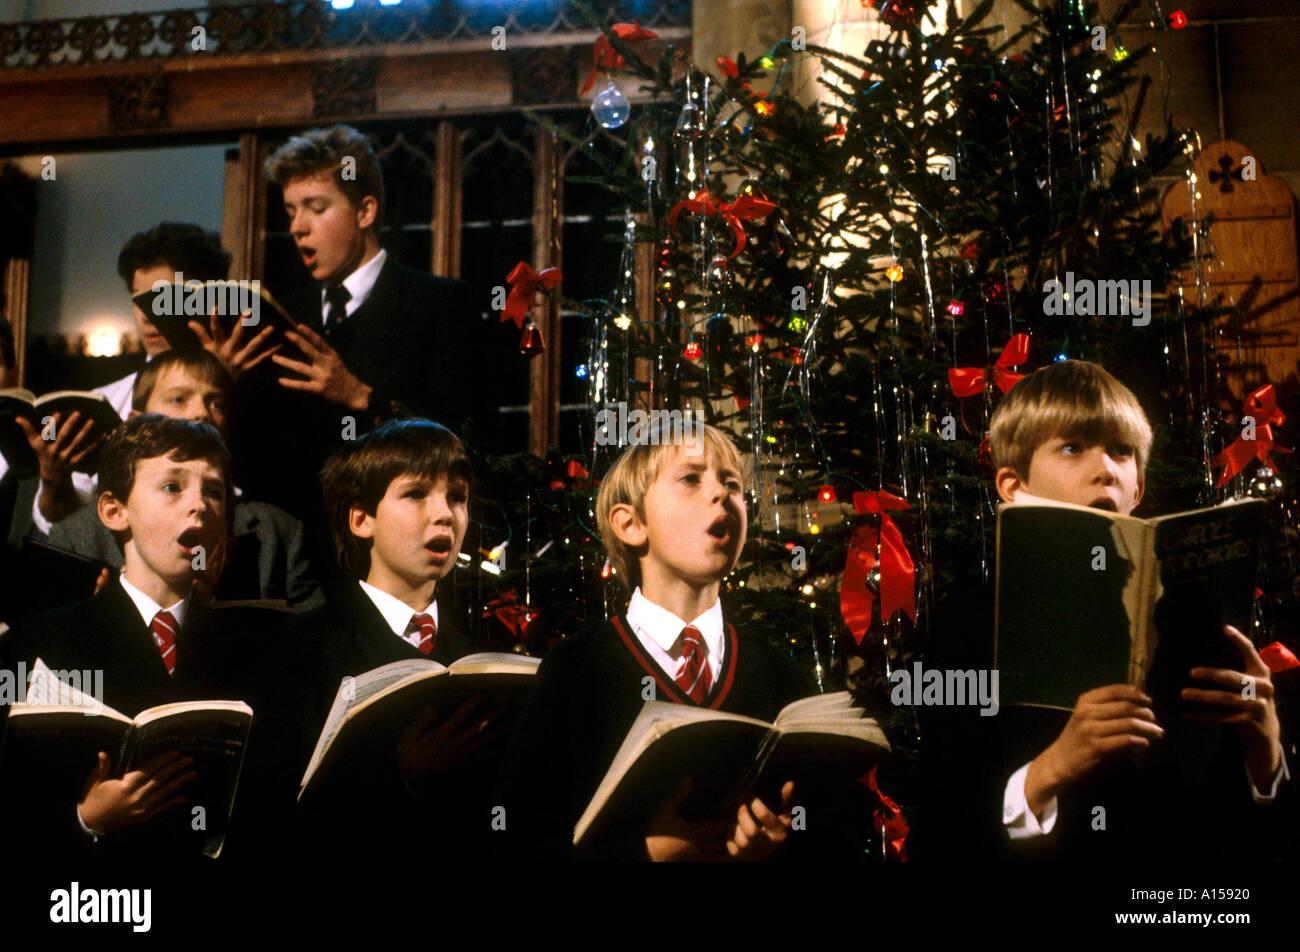 Carol service choir at Christmas England UK A Woolfitt - Stock Image